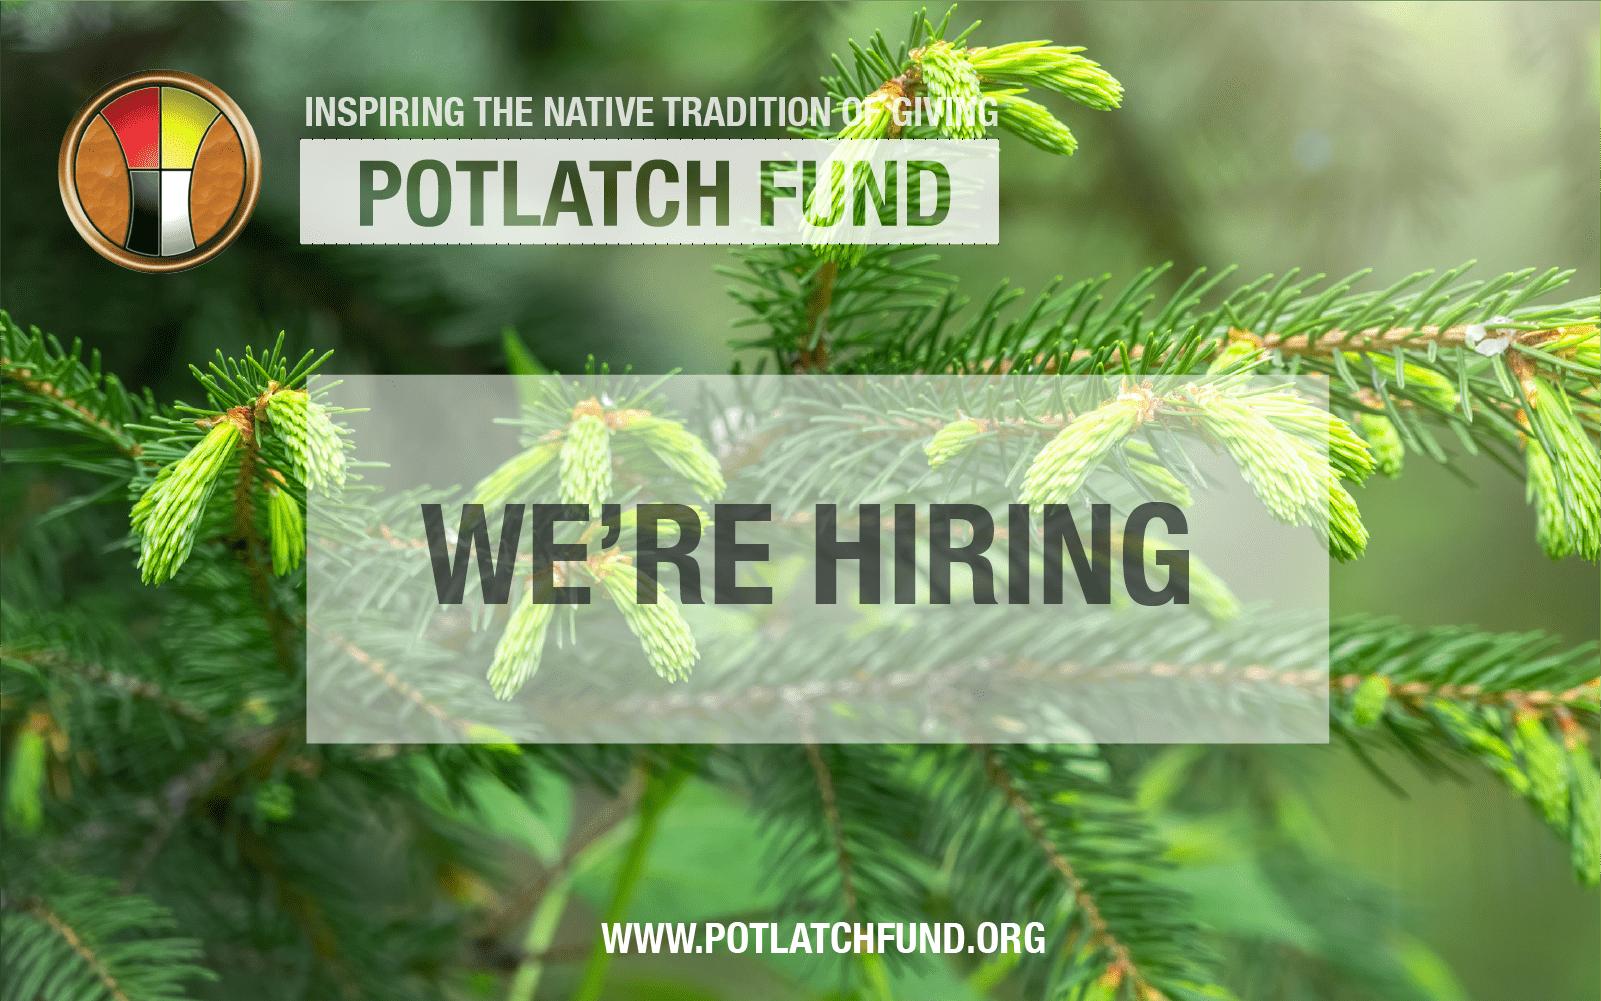 Potlatch Fund is Hiring